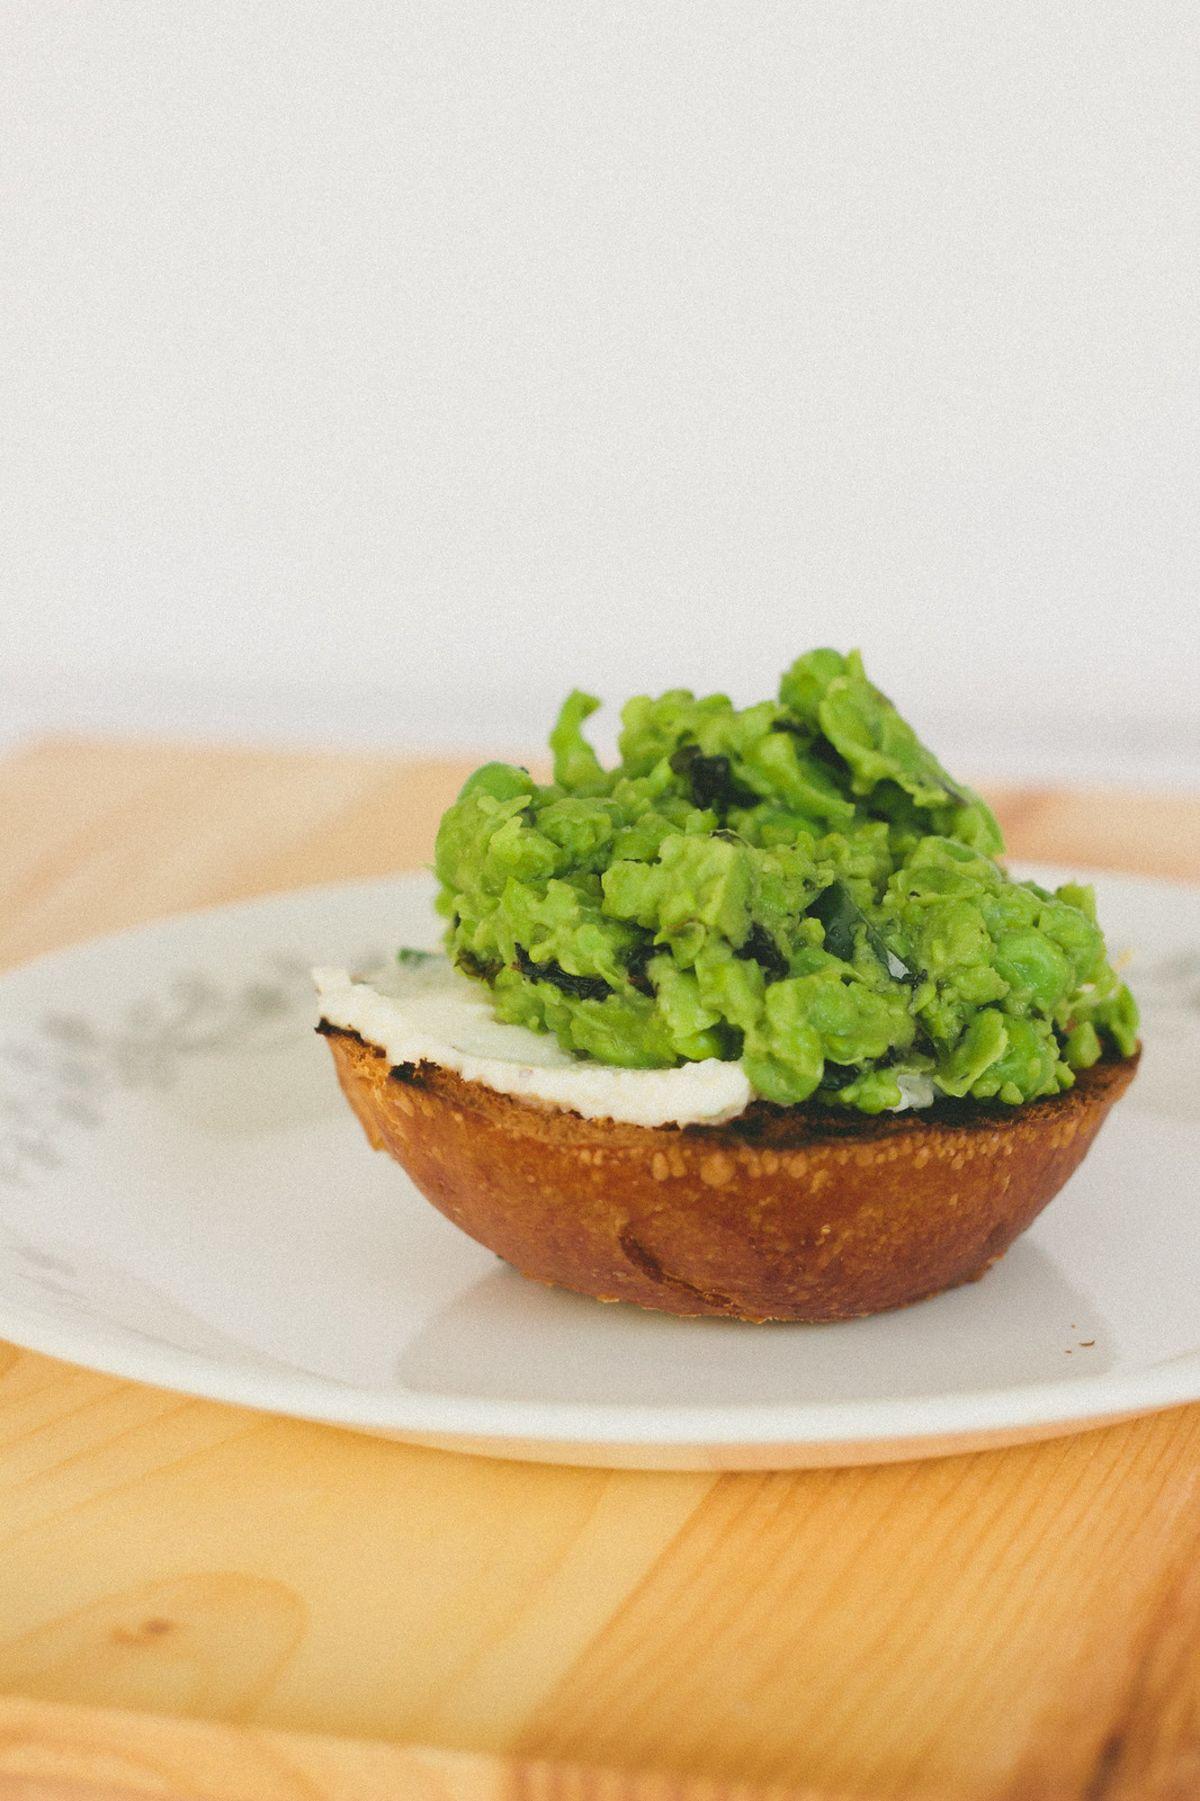 Green Peas Mint and Chili Tartine